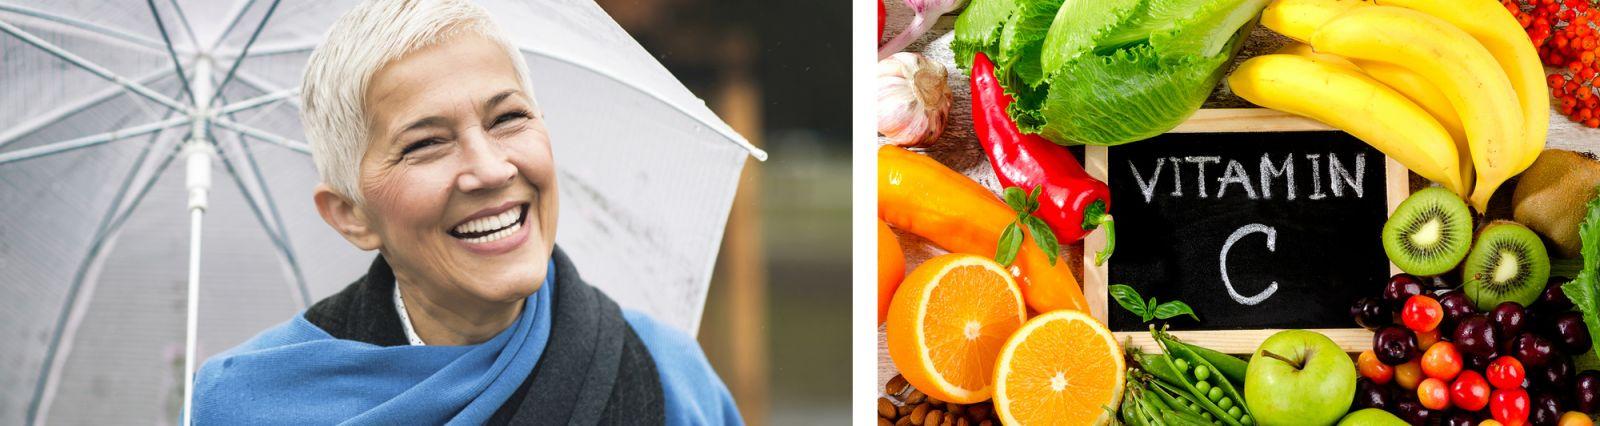 Vitamin C Senioren